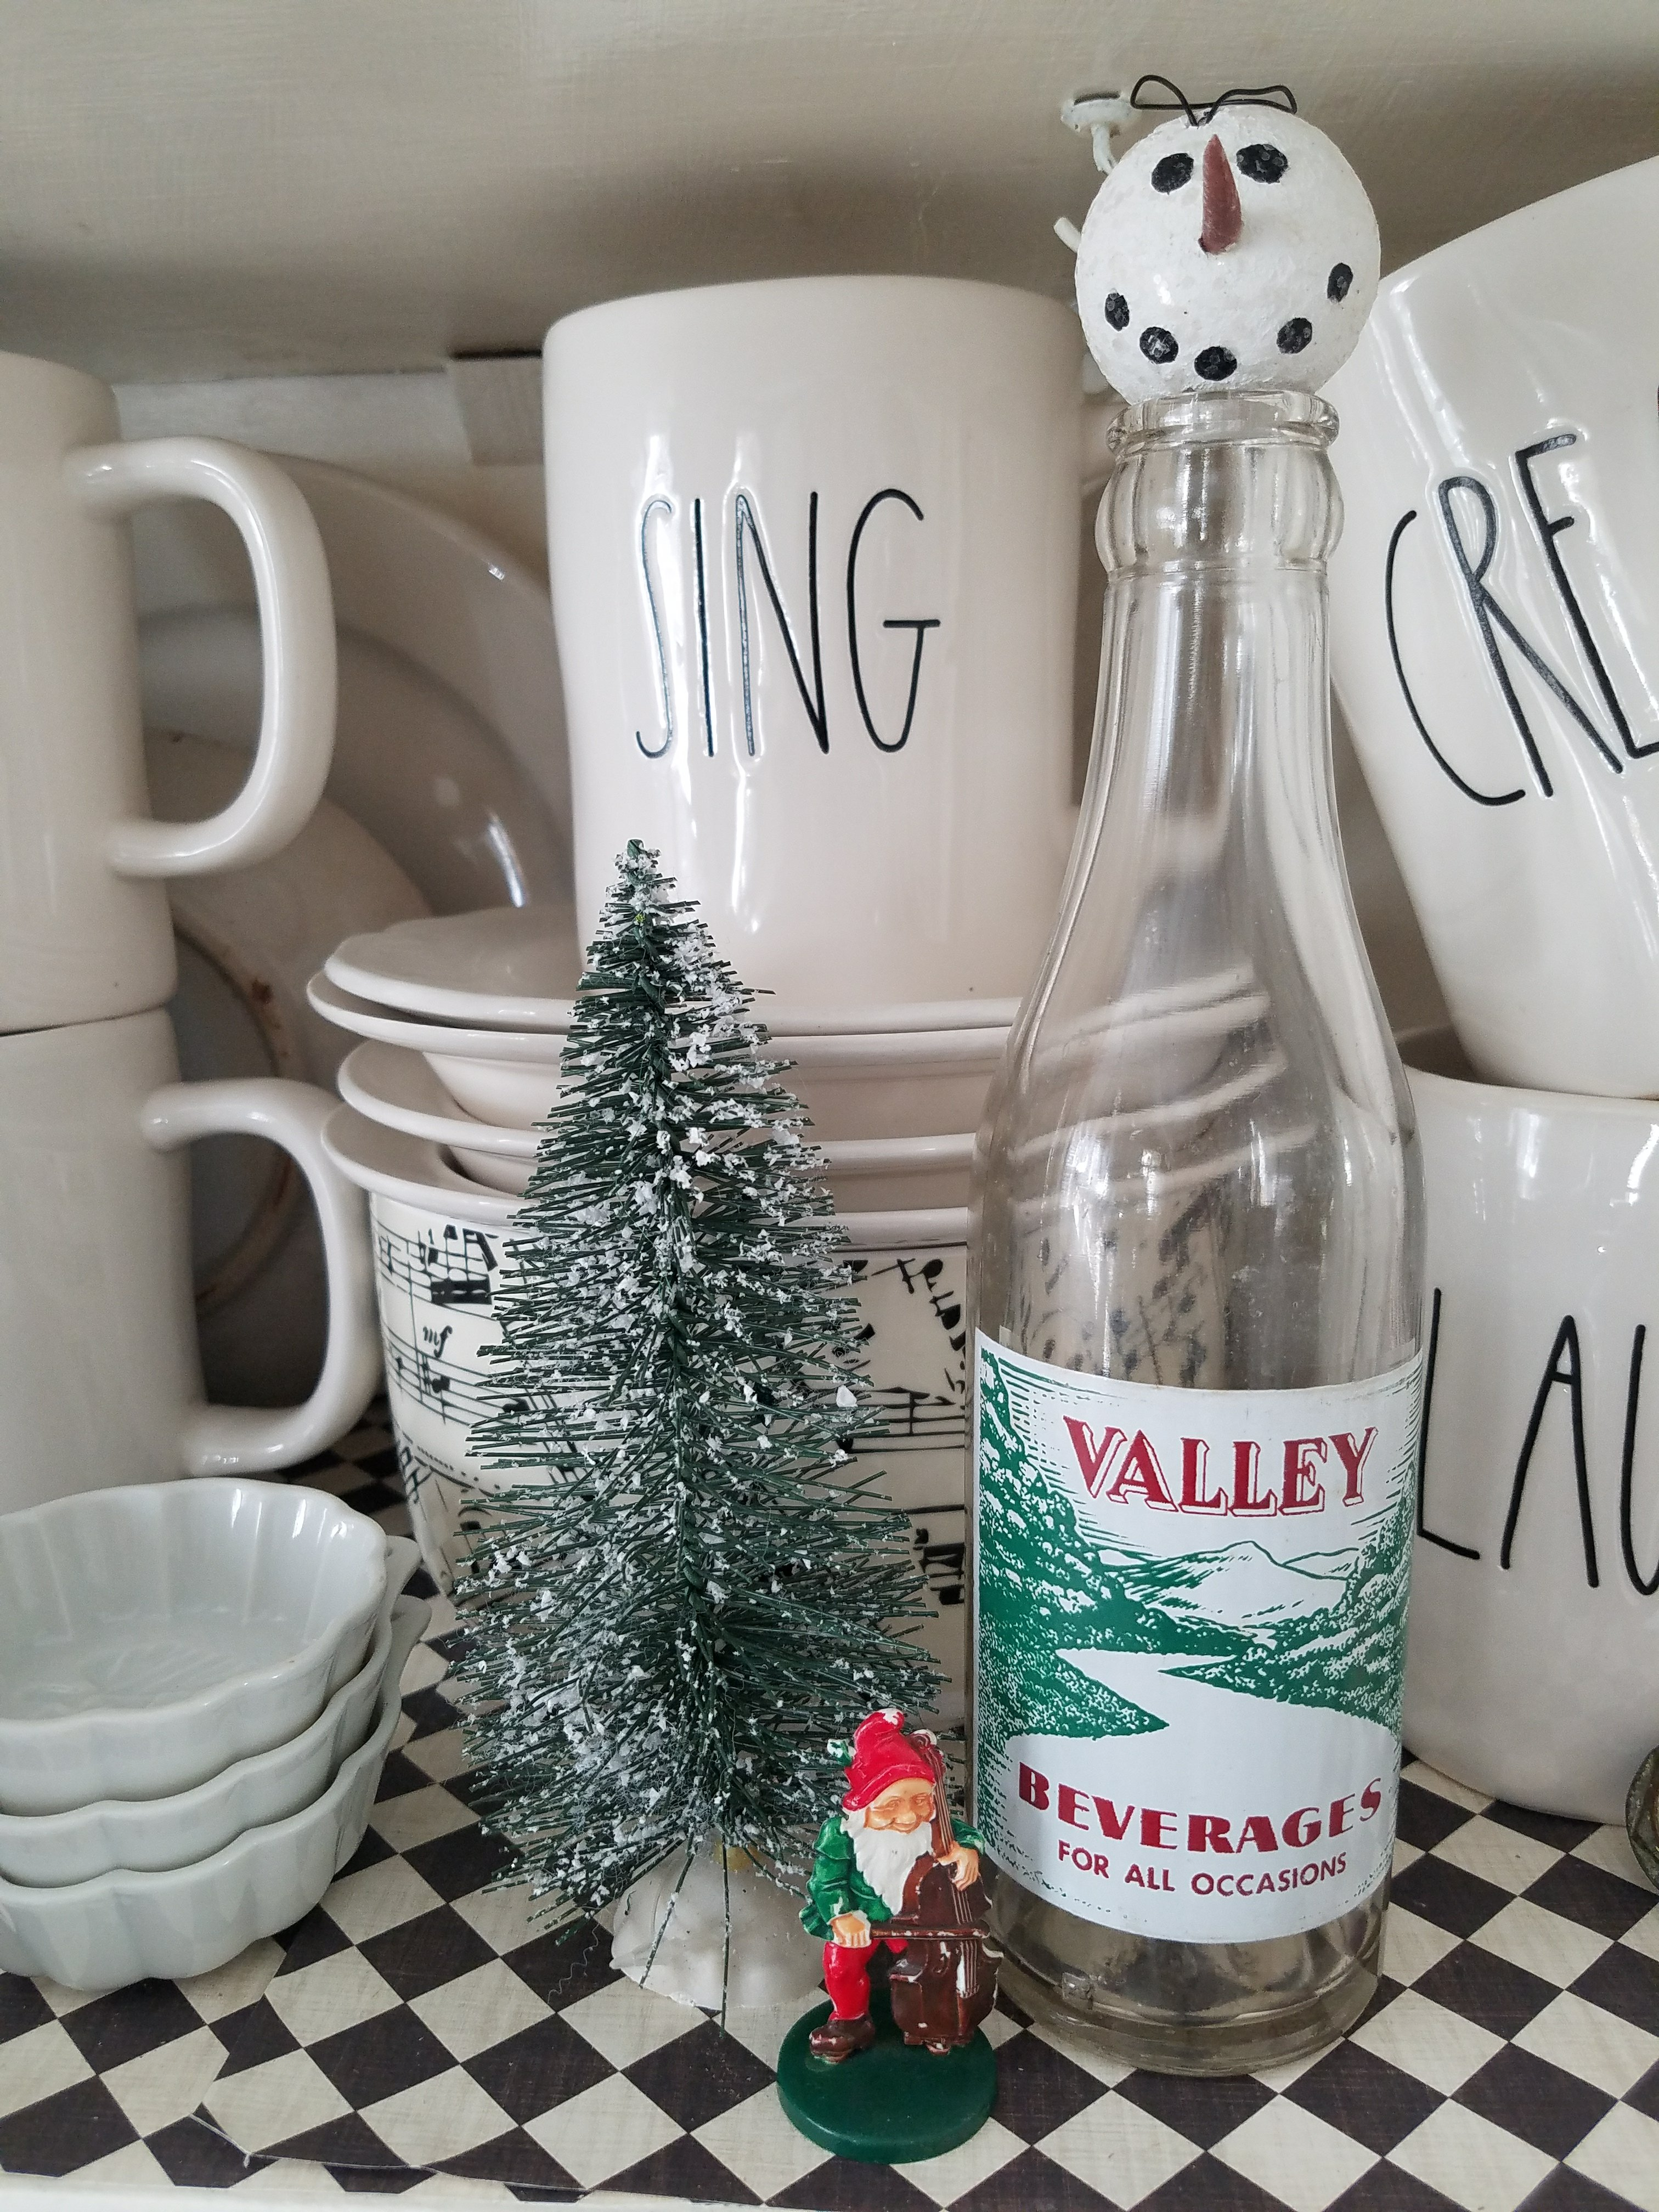 Vintage soda bottle as Christmas decor